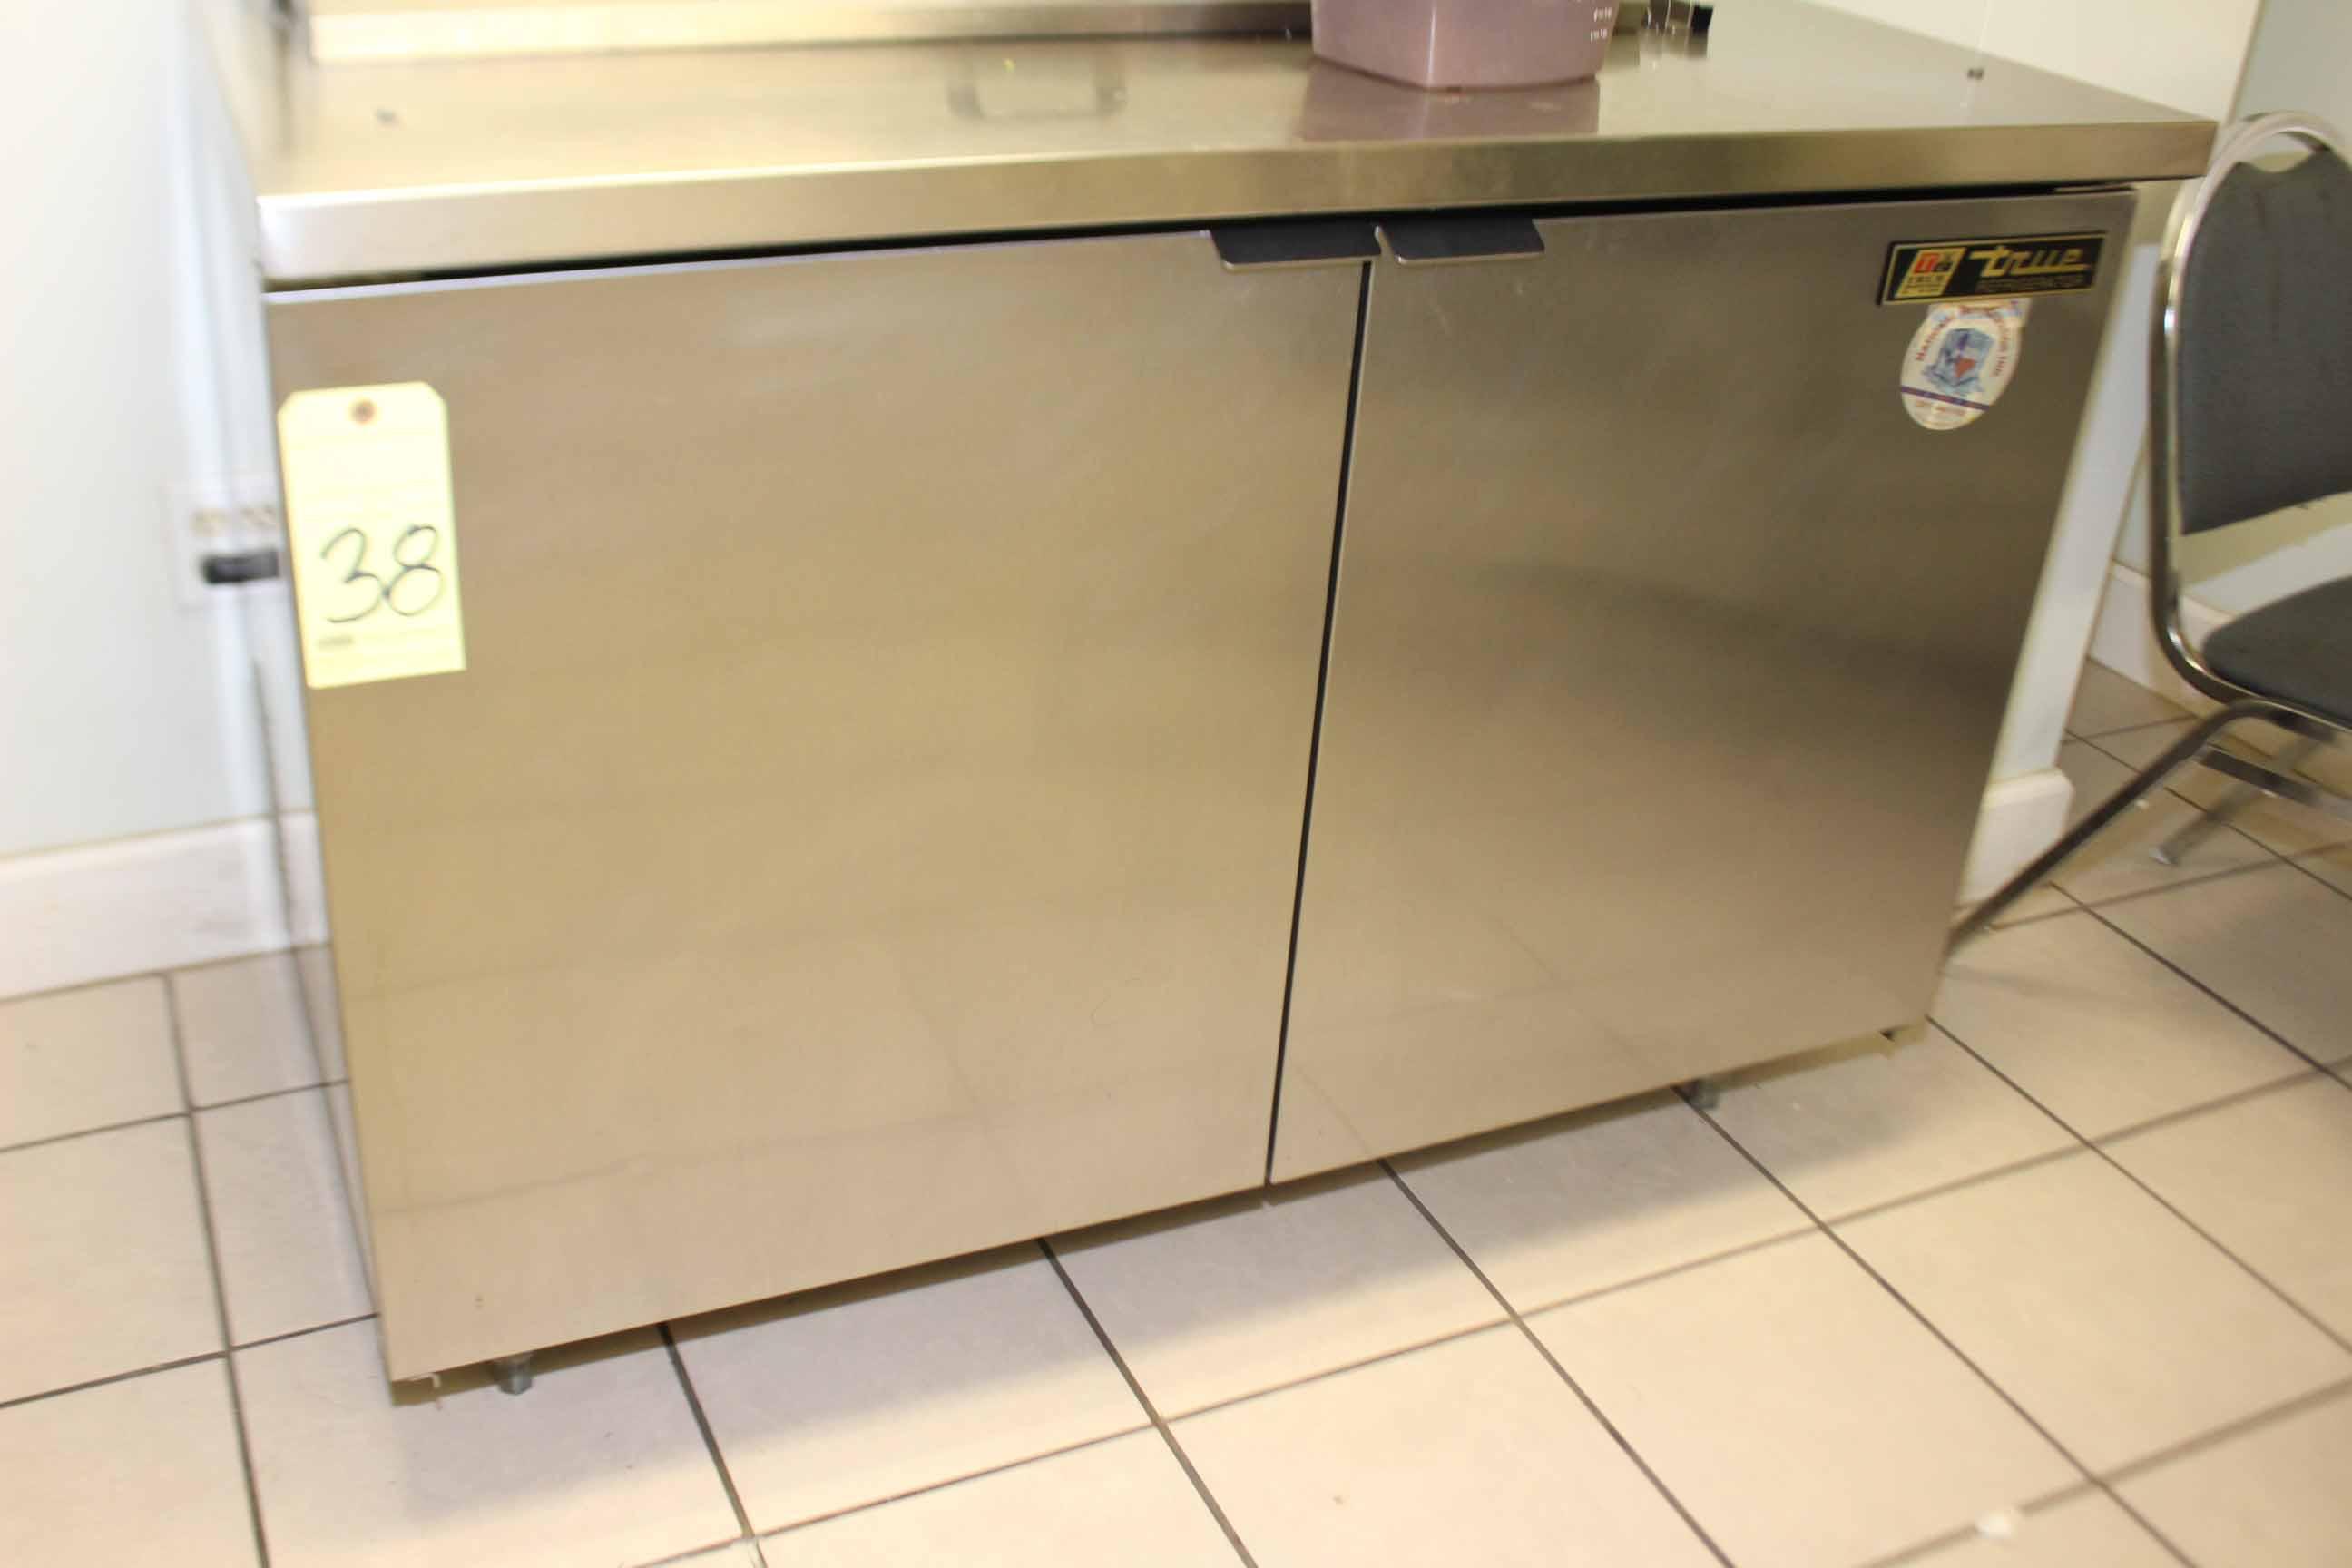 Lot 38 - LOT CONSISTING OF: prep table & True refrigerator